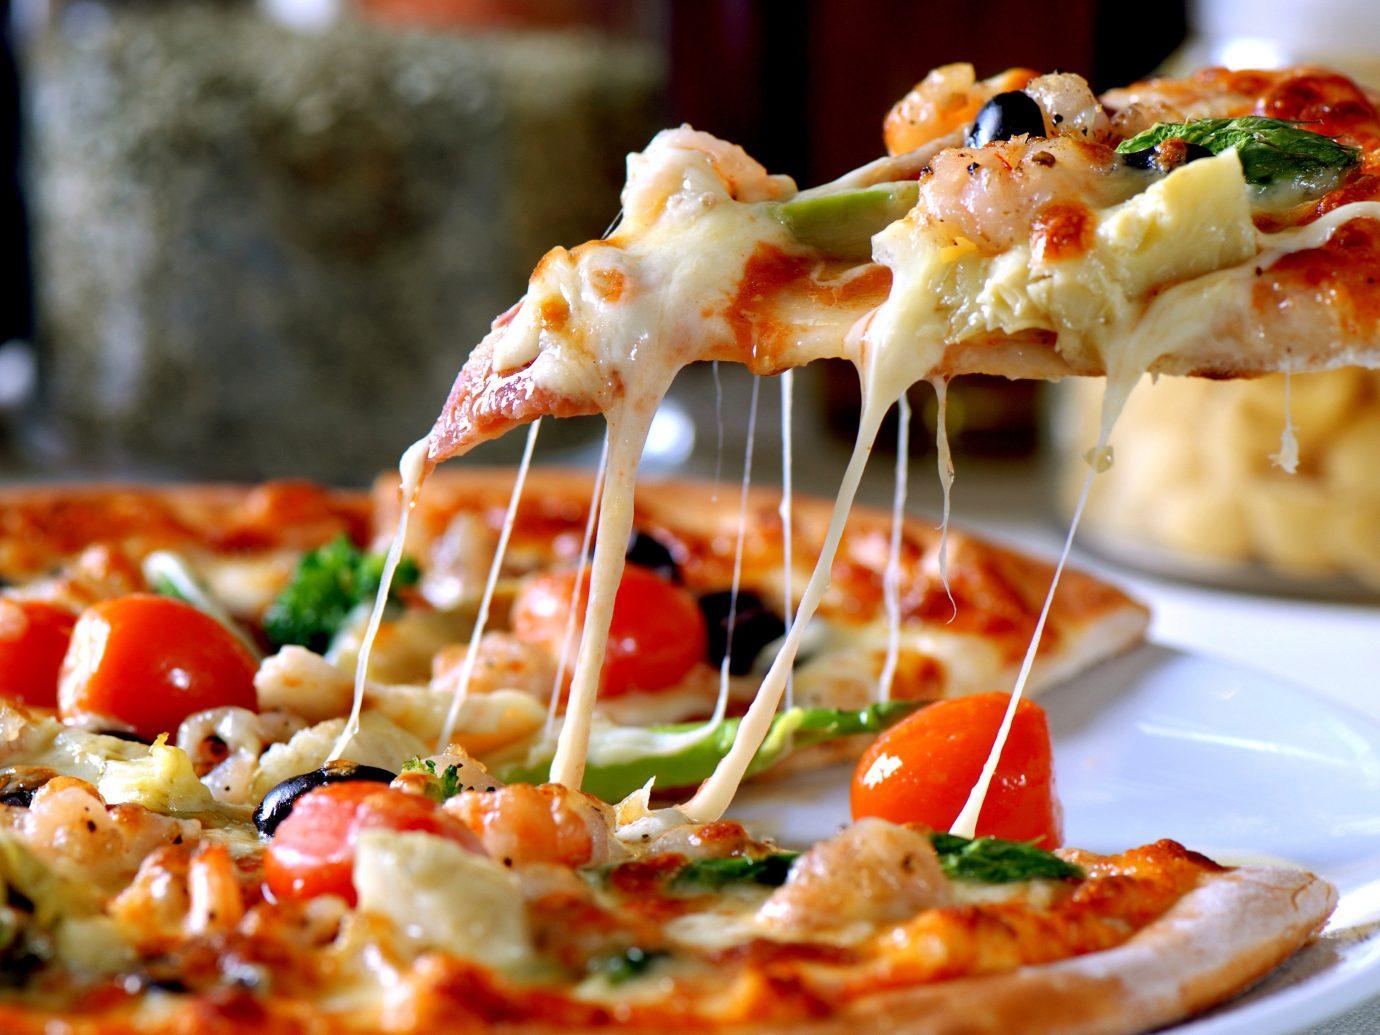 Trip Ideas food dish plate pizza cuisine slice piece italian food hors d oeuvre meal bruschetta european food produce close shrimp toppings fresh square sliced